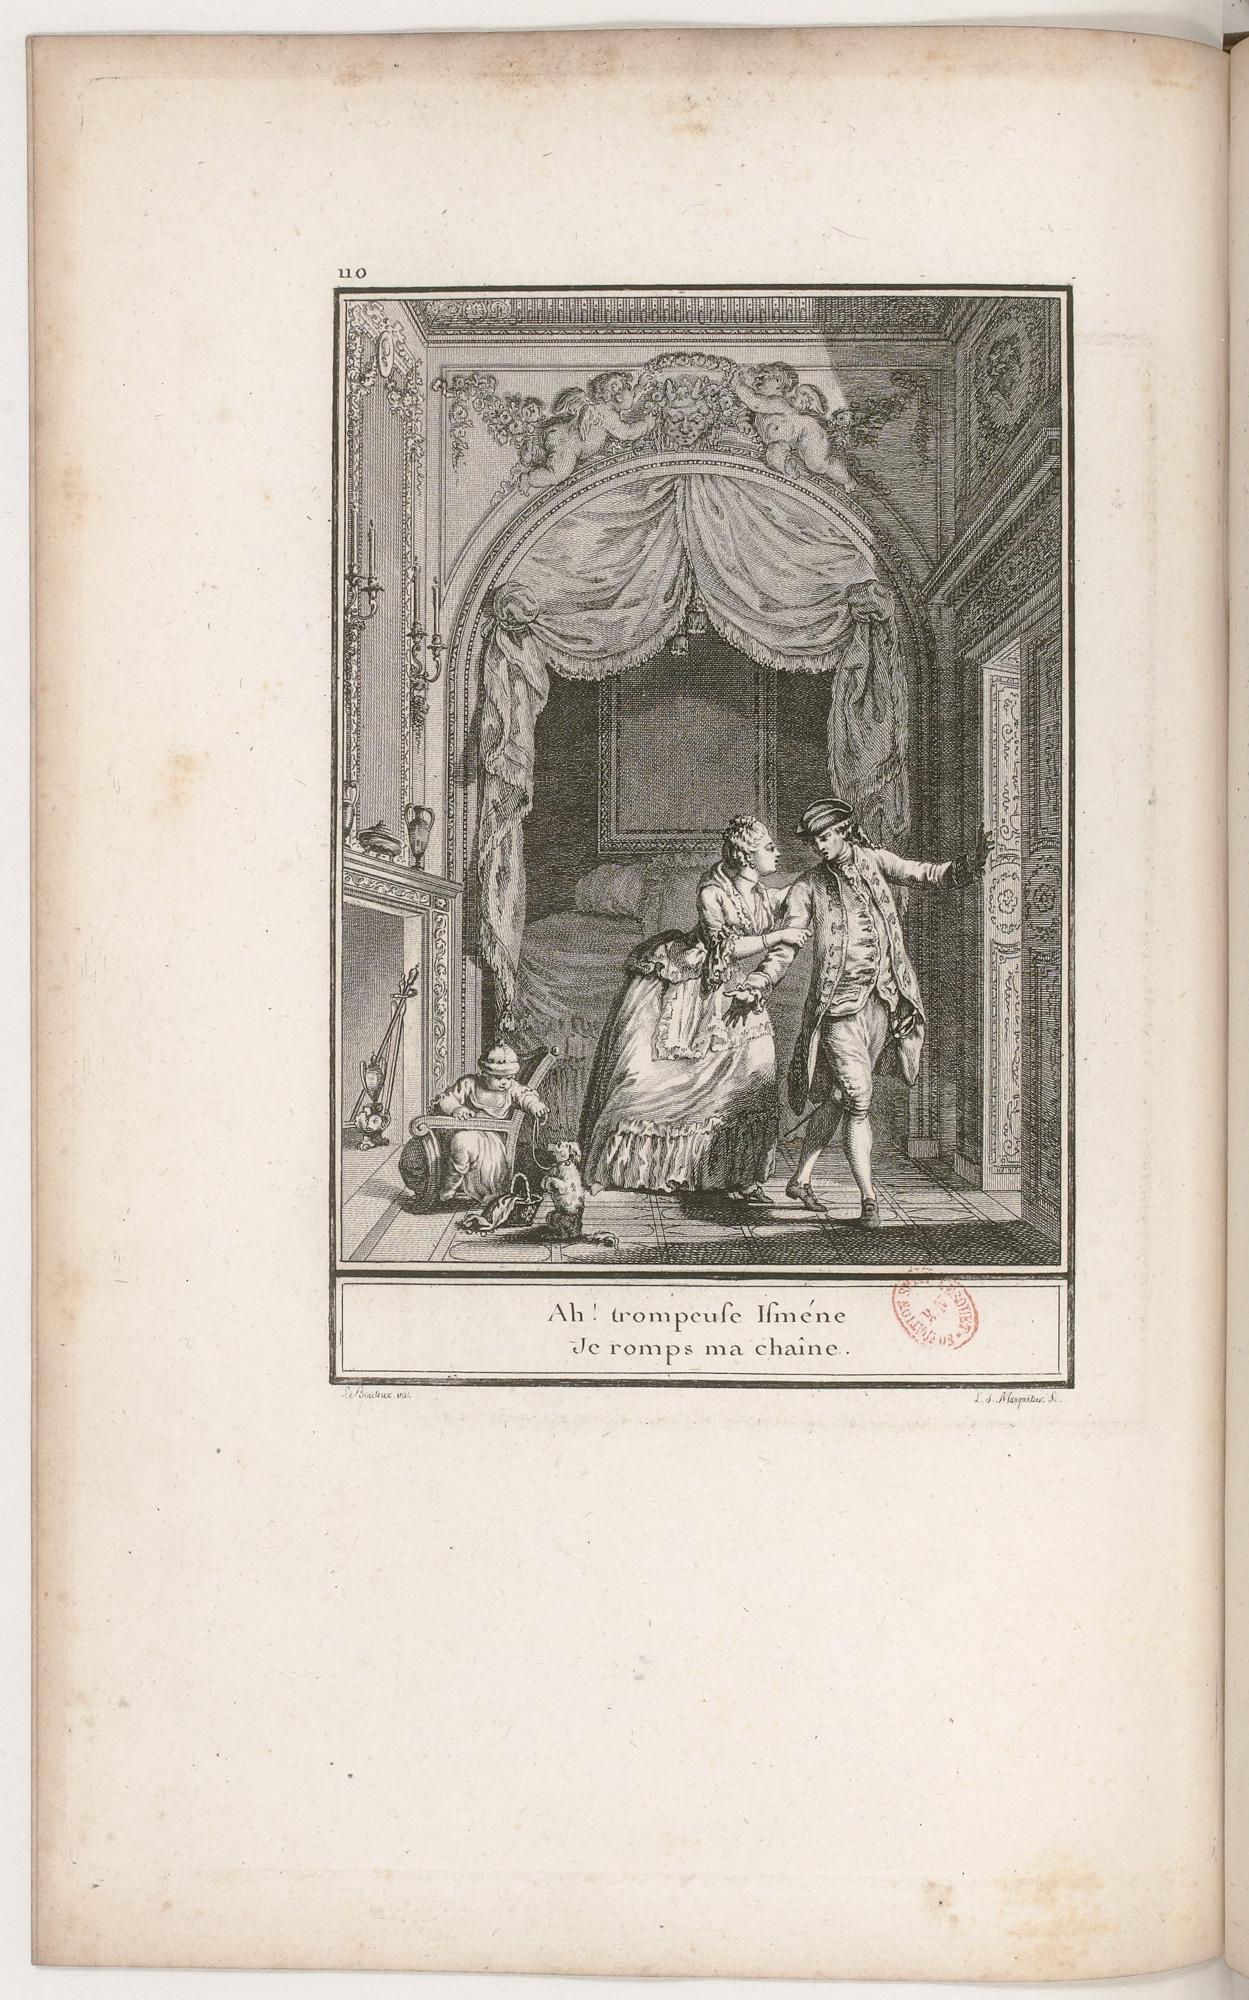 S.2.19 La rupture,1772, Image